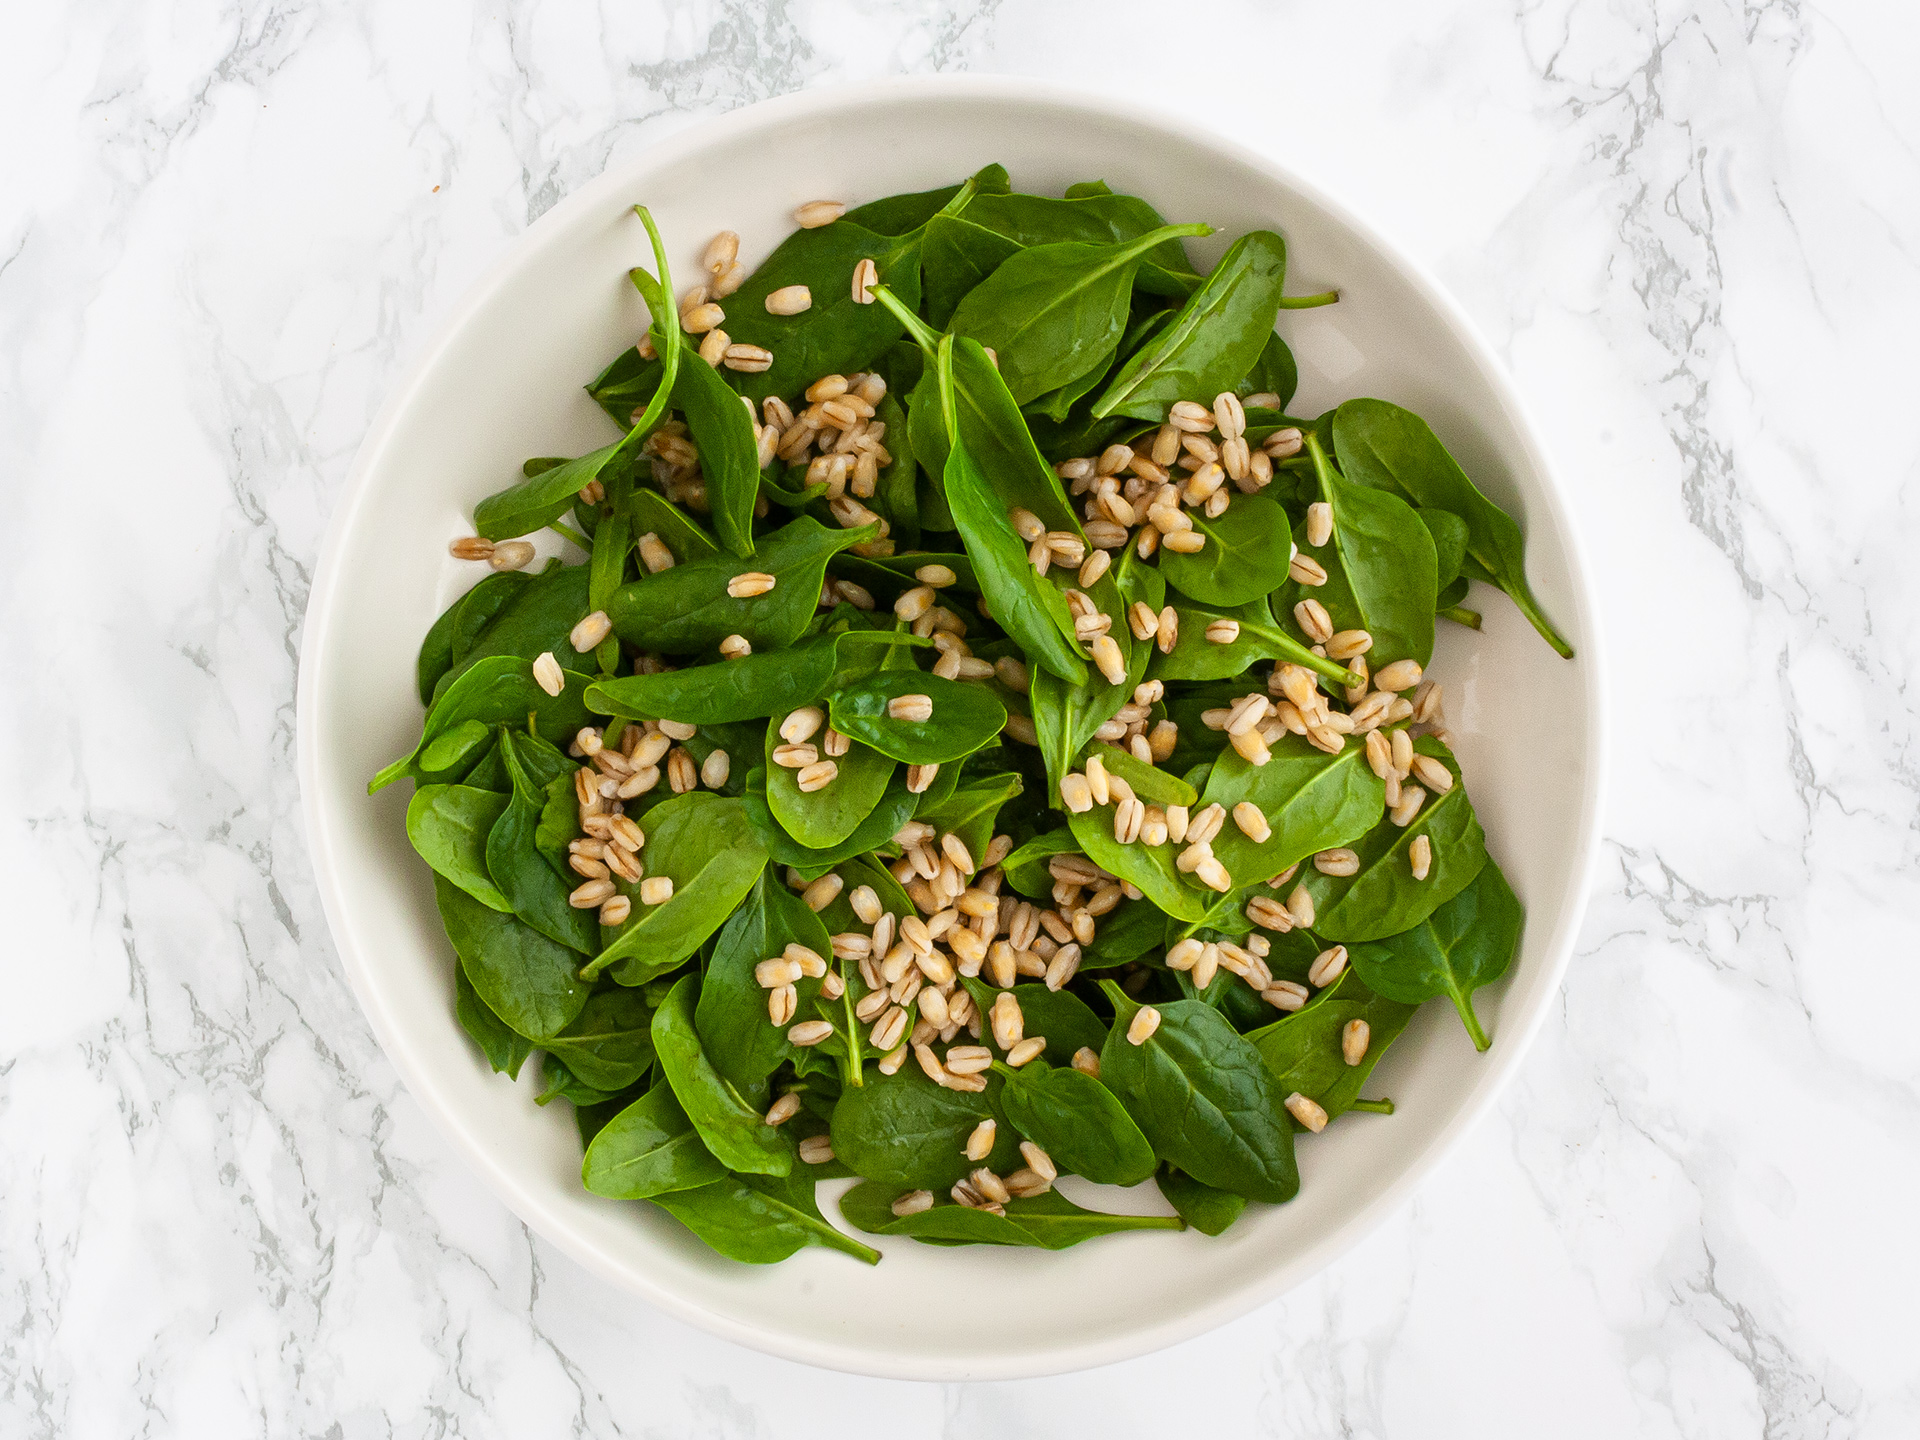 Step 2.1 of Pumpkin Spinach and Feta Salad Recipe